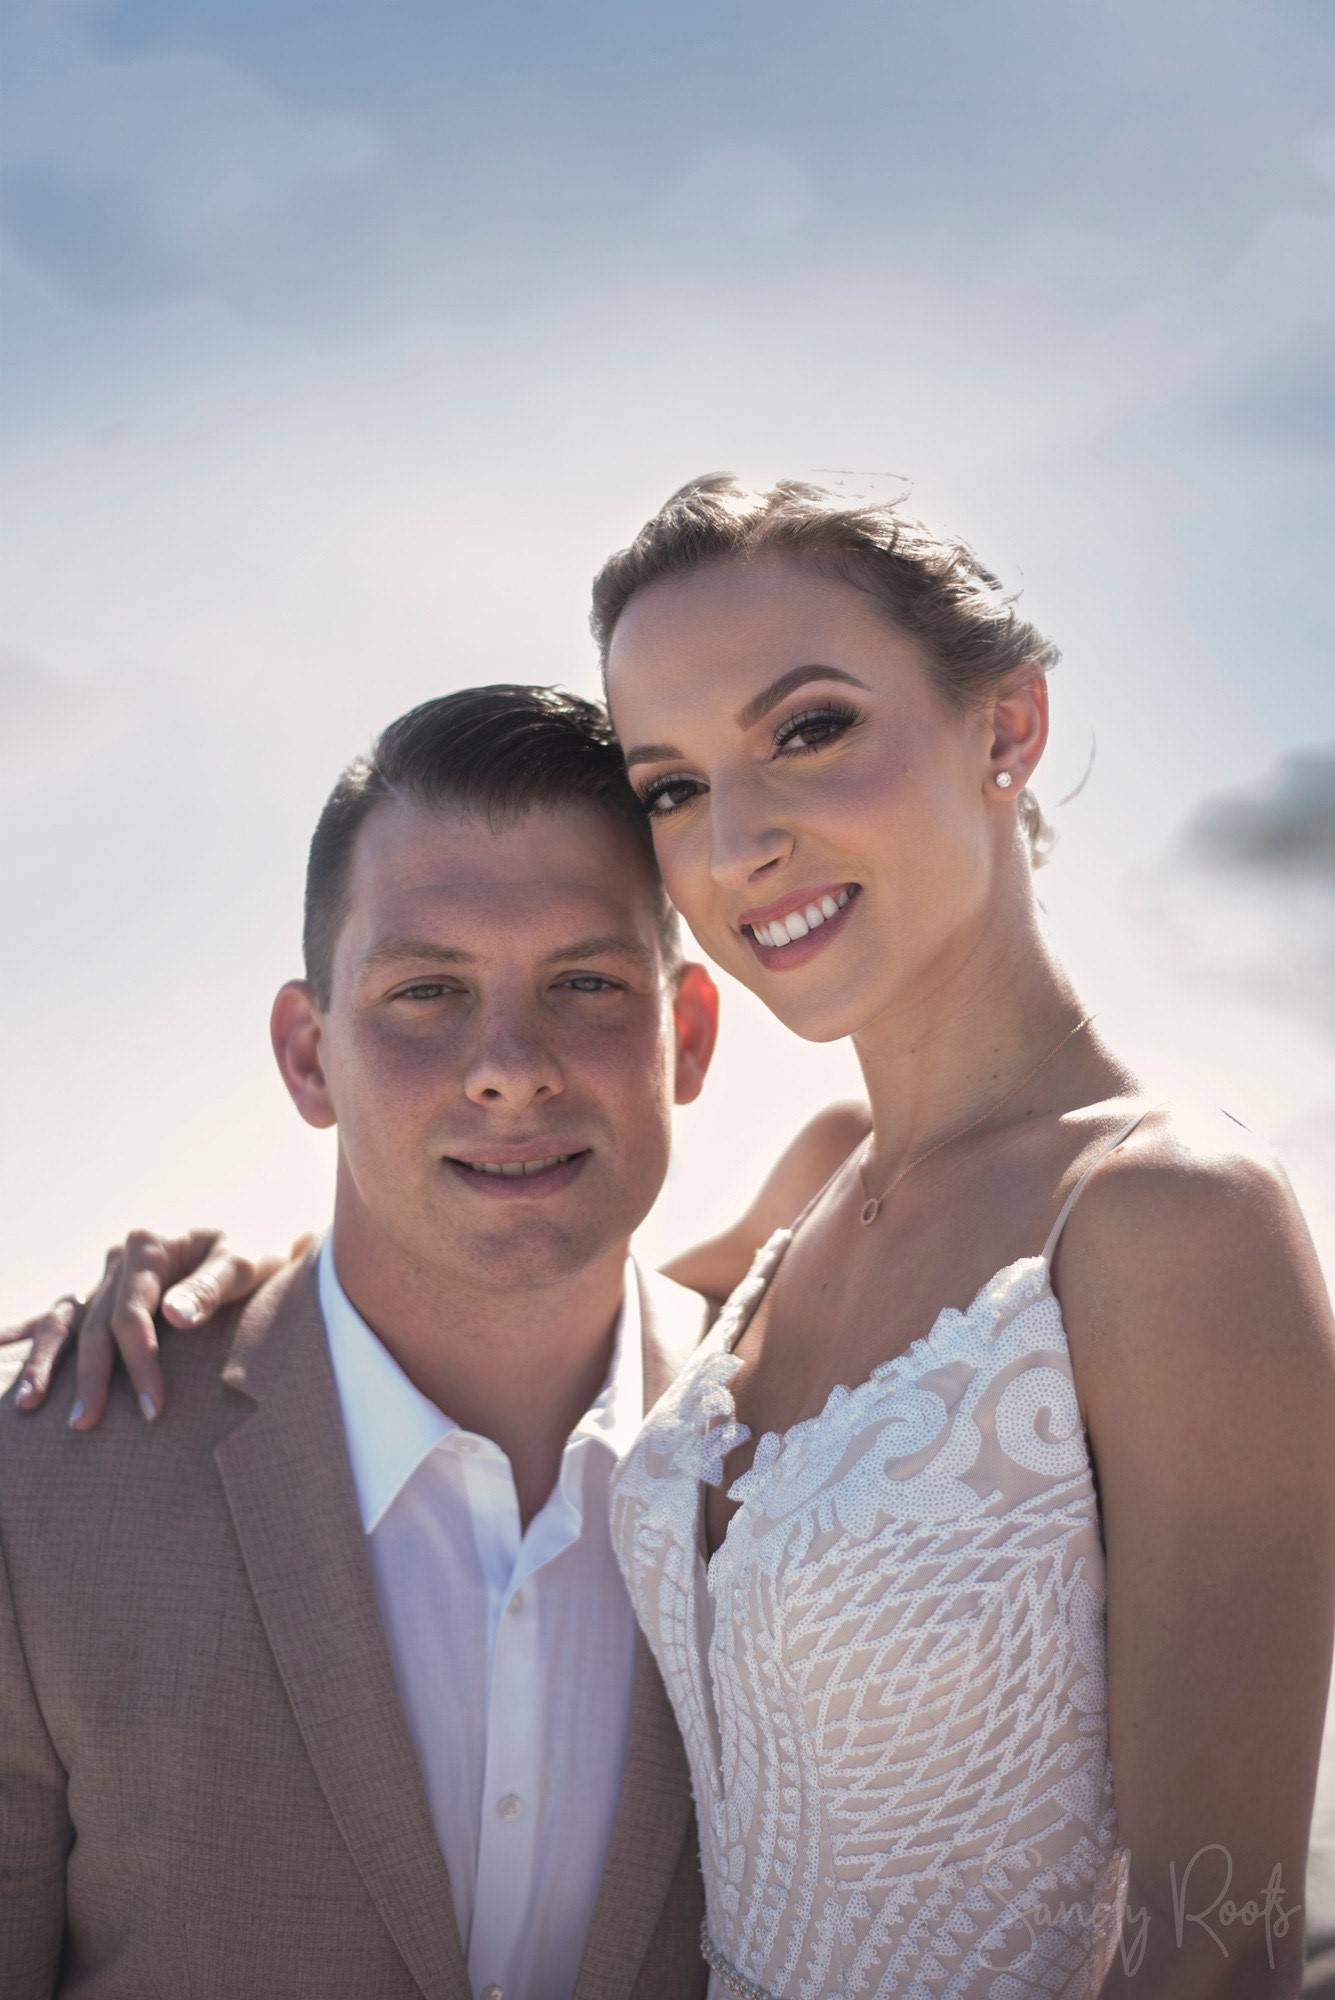 Mr. and Mrs. Michael Blackford